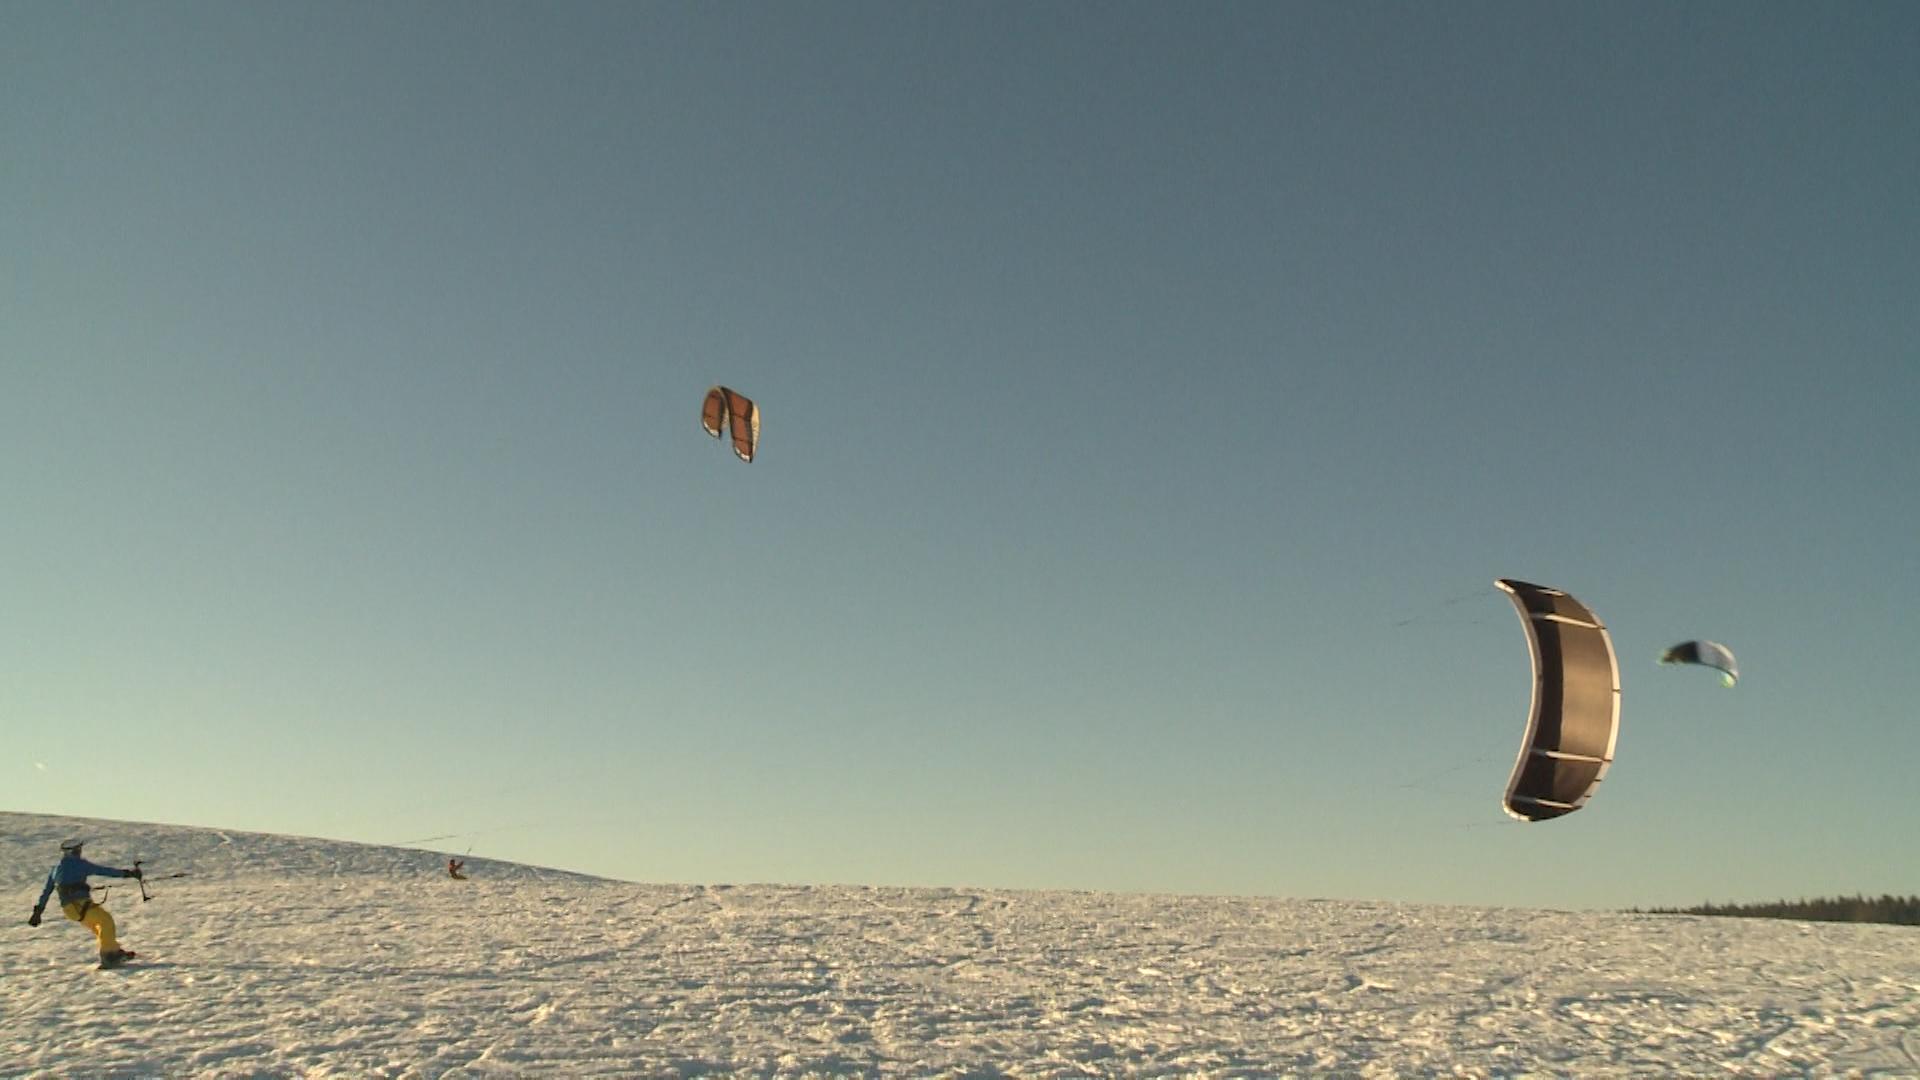 kitesurfen aktion1.jpg